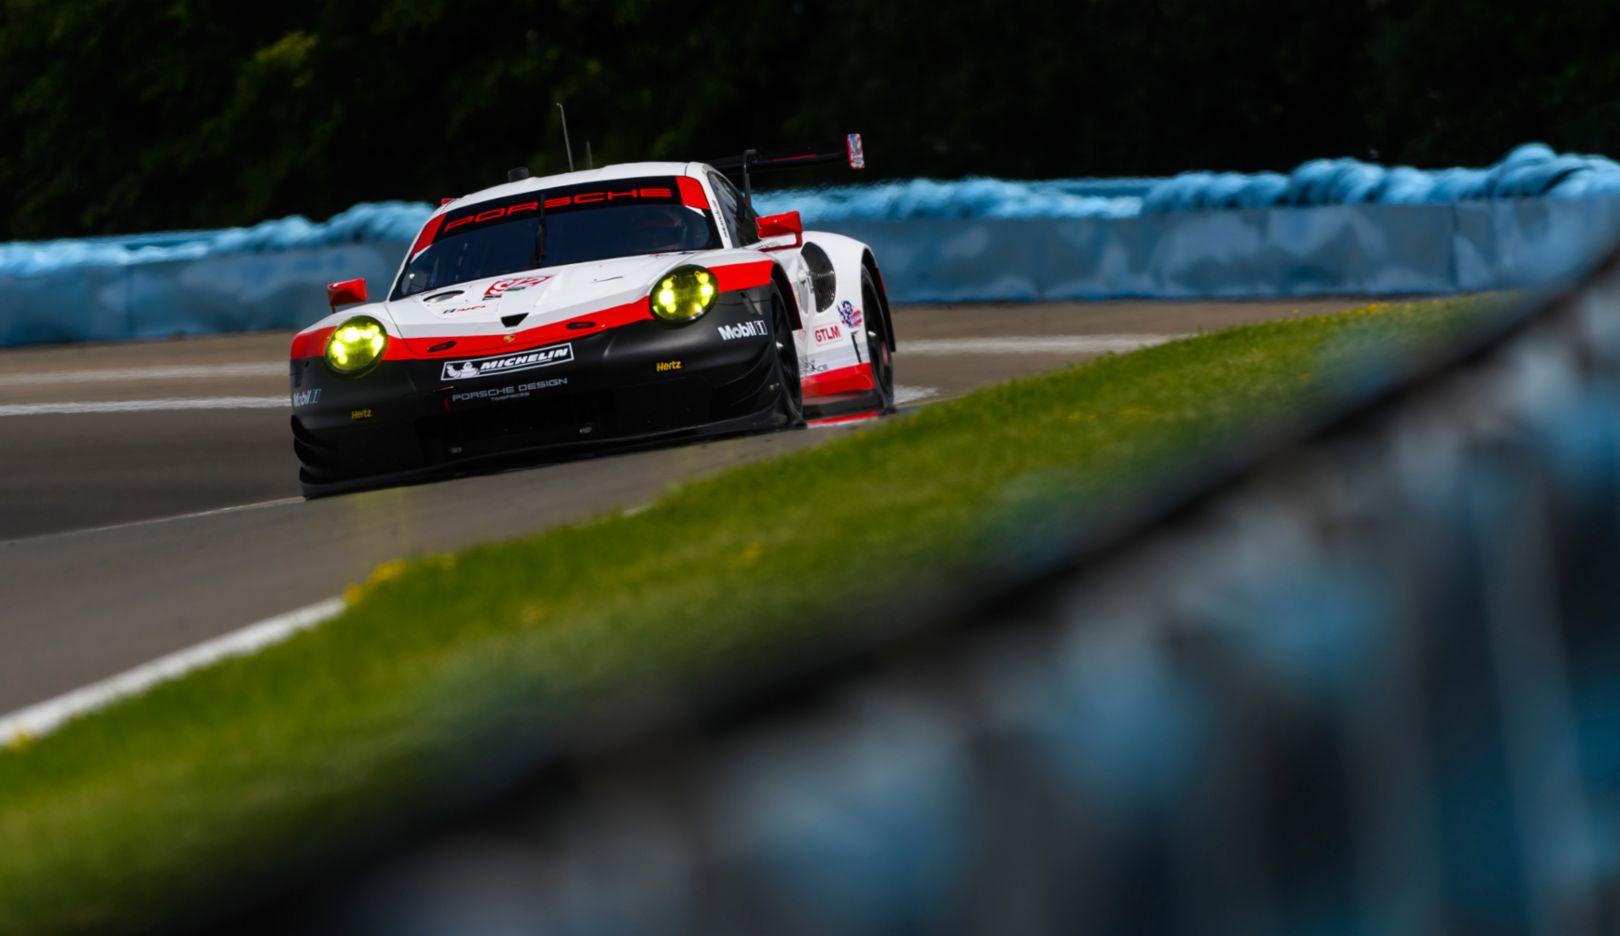 911 RSR, IMSA WeatherTech Sportscar Championship, 6. Lauf, Bowmanville/ Kanada, 2017, Porsche AG